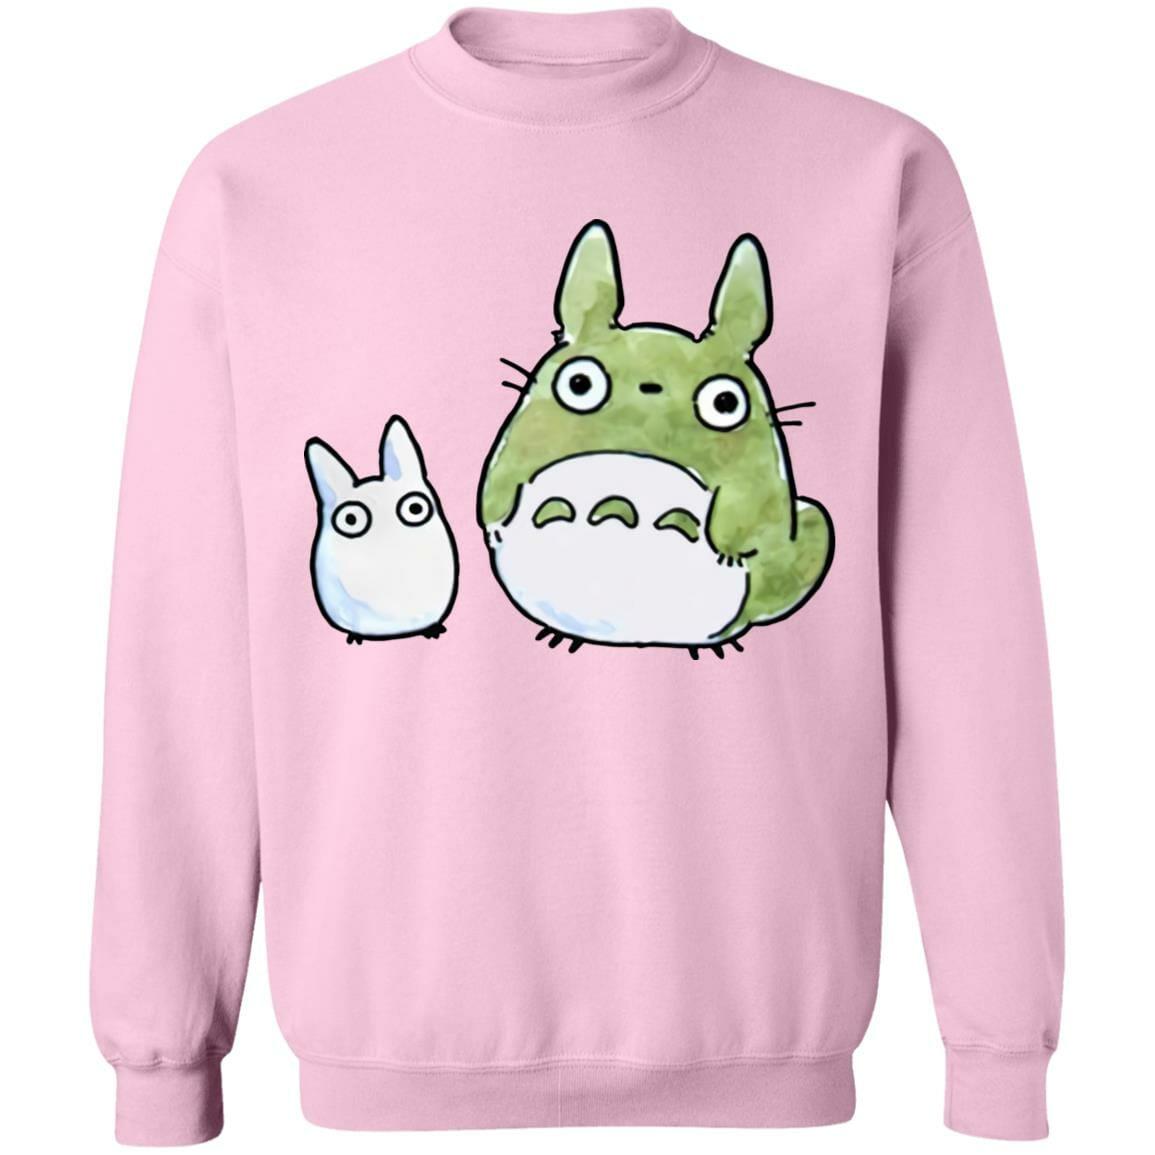 Totoro Family Cute Drawing Sweatshirt